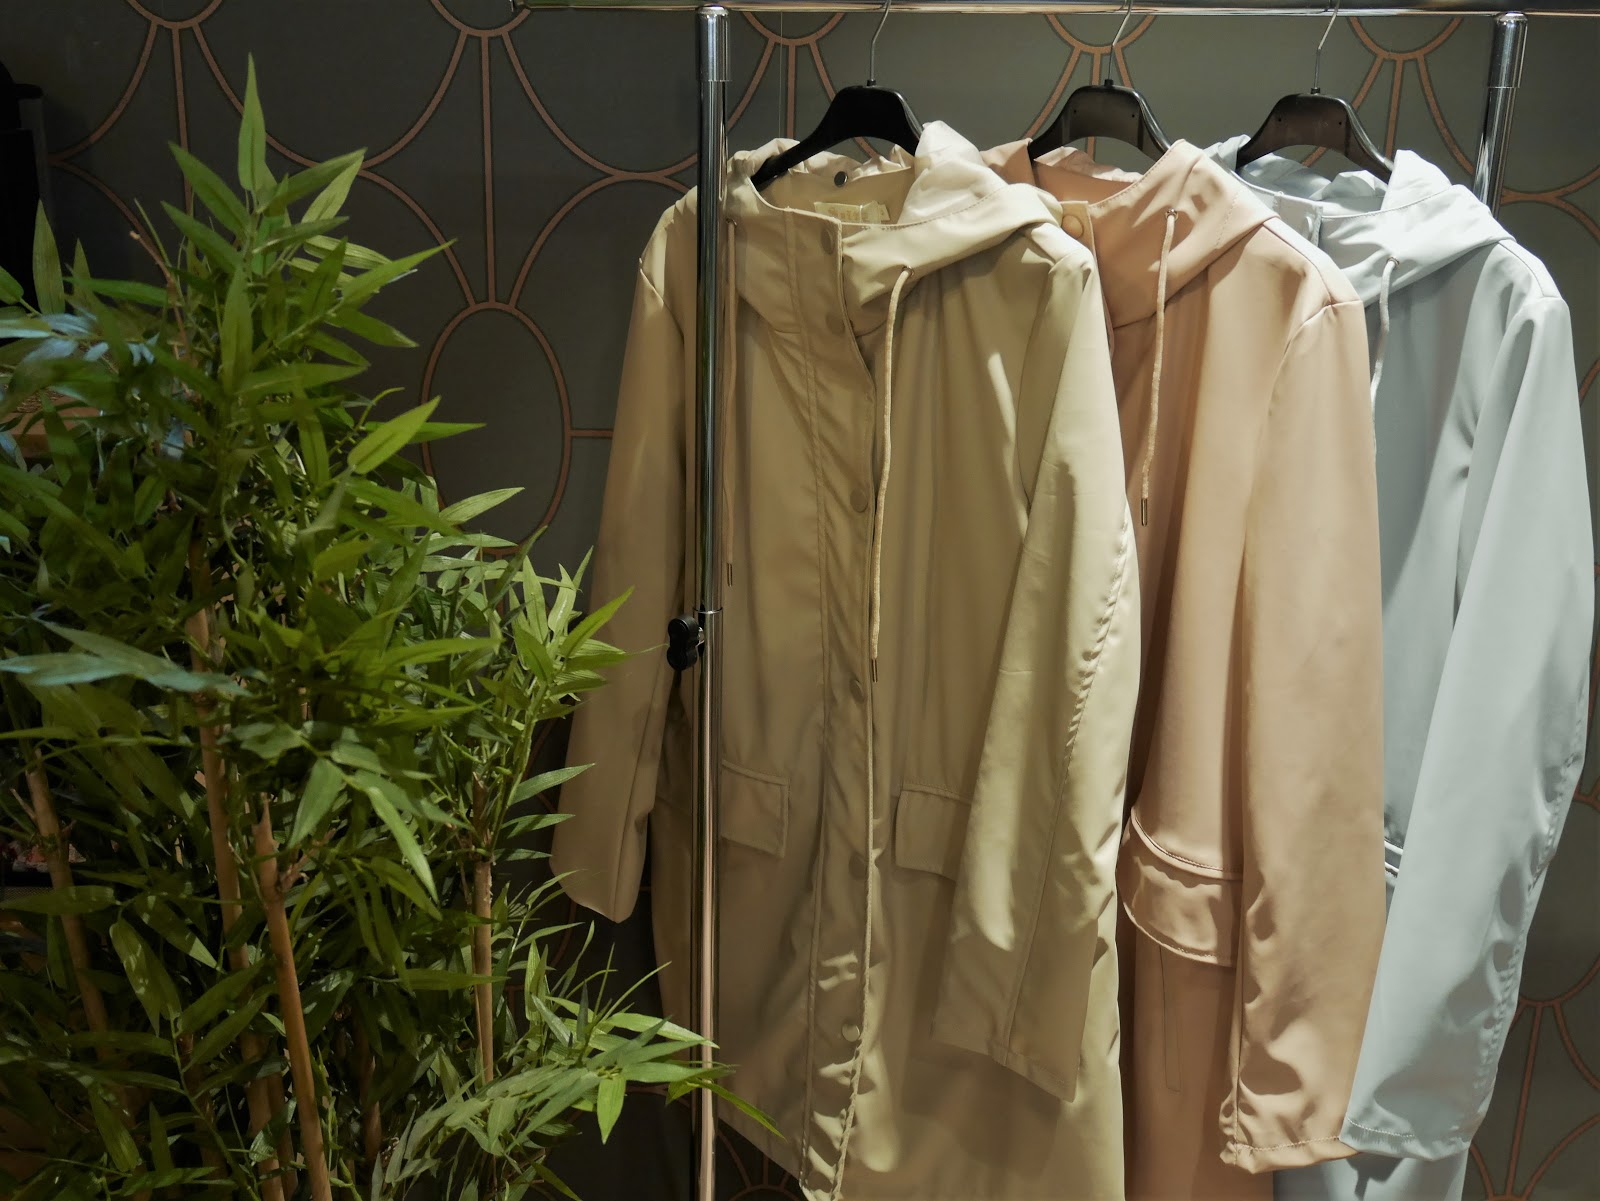 twinz-boutique-pret-a-porter-antony-ciré-danslaruedacote.fr